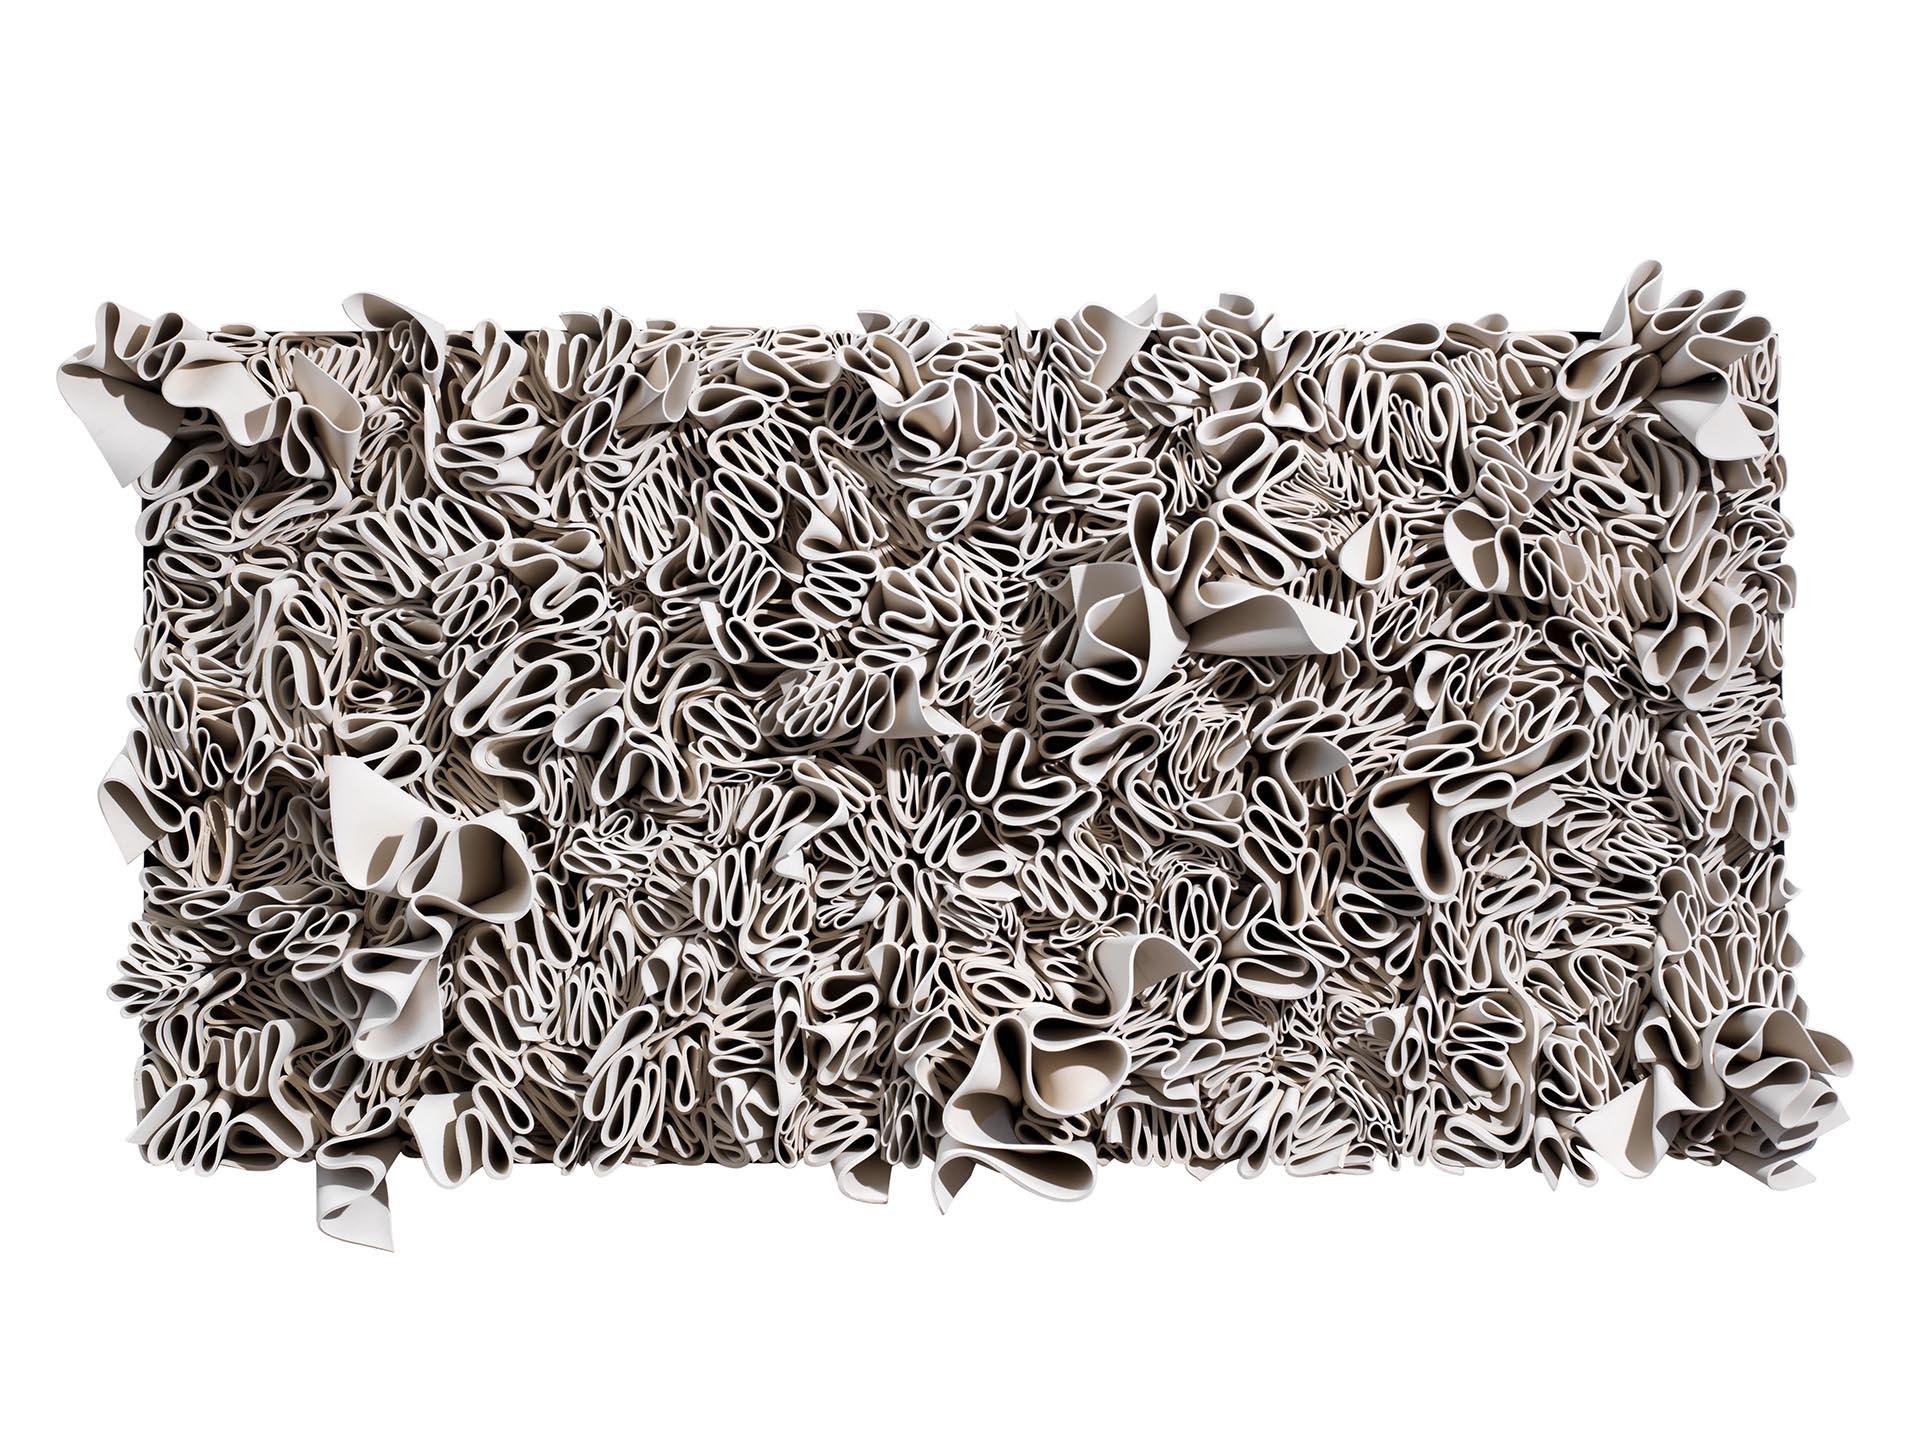 Pasquali, Frappa bianca, 2013, 80x160x22 cm